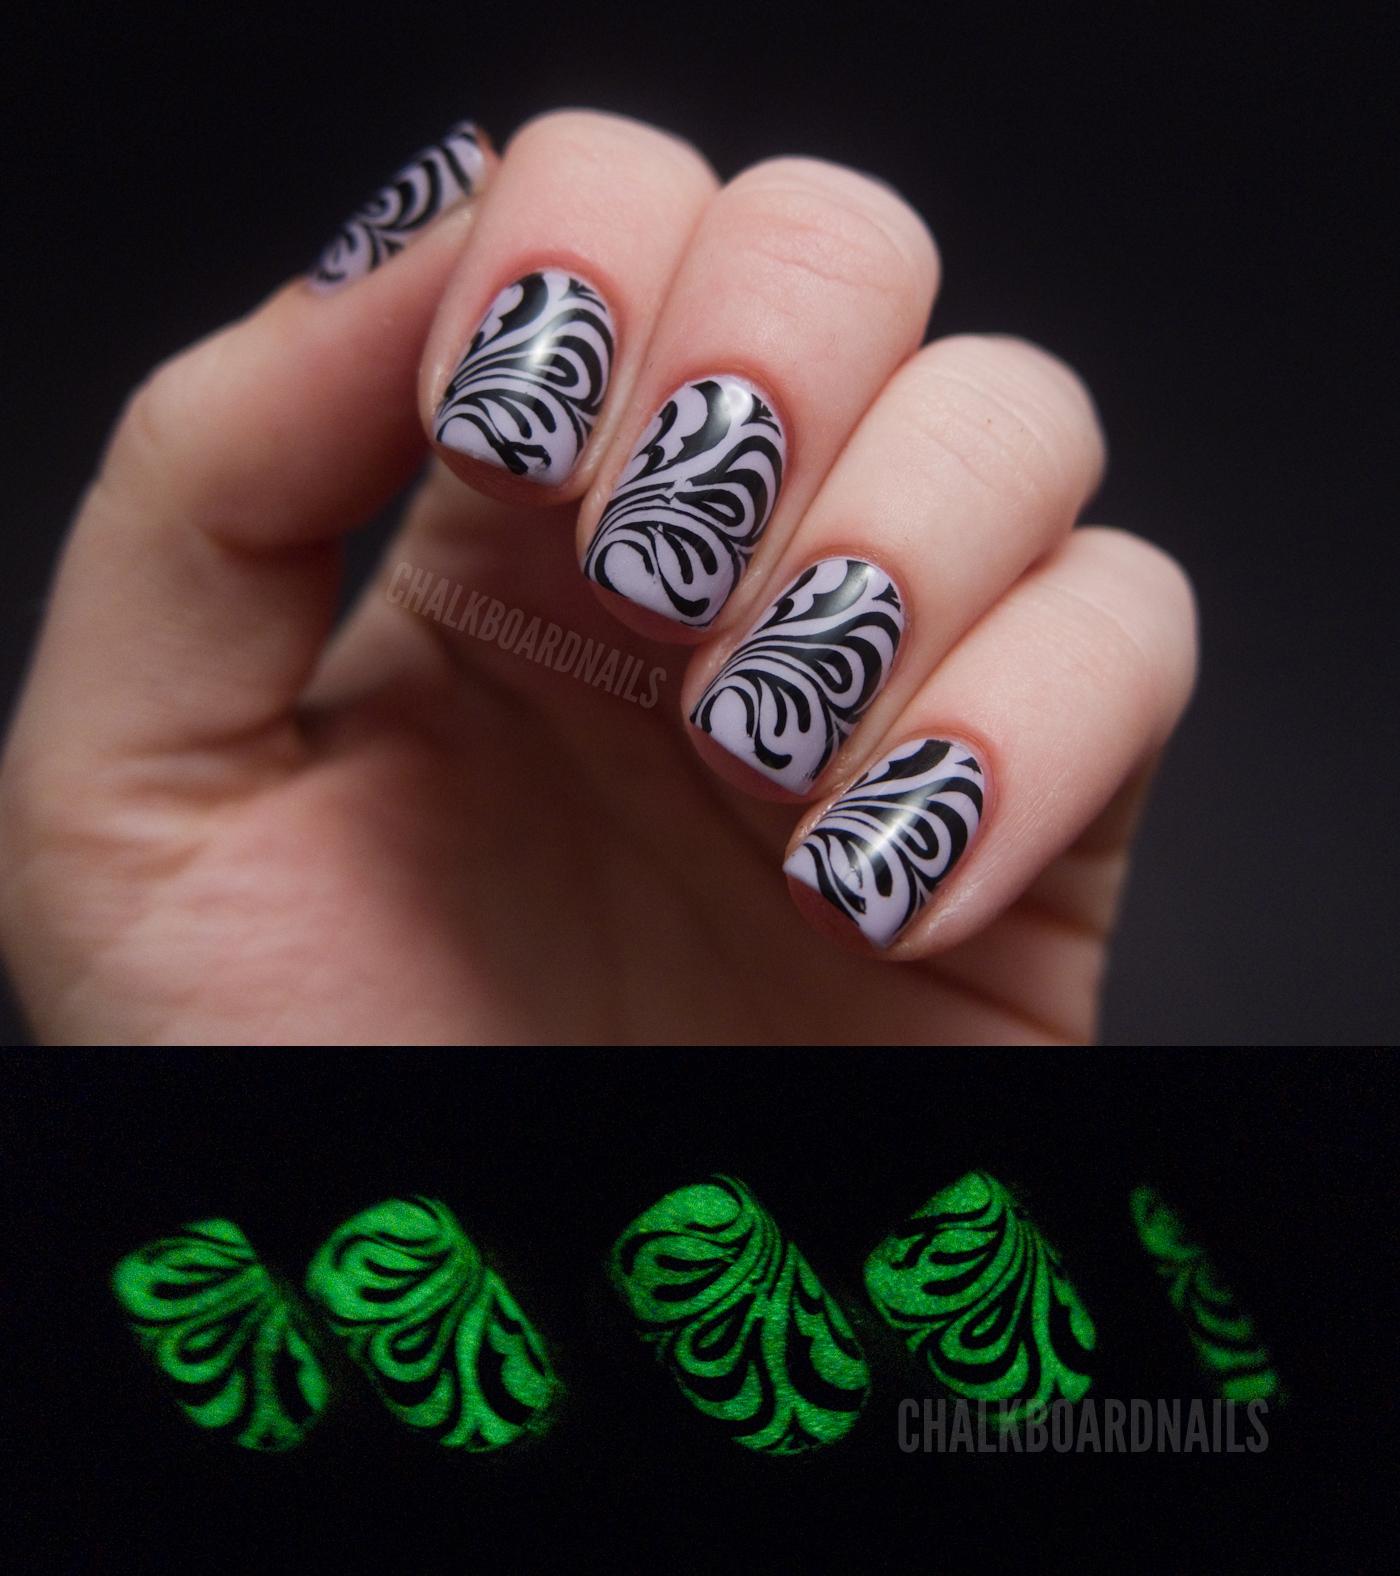 Spooky Stamping | Chalkboard Nails | Nail Art Blog